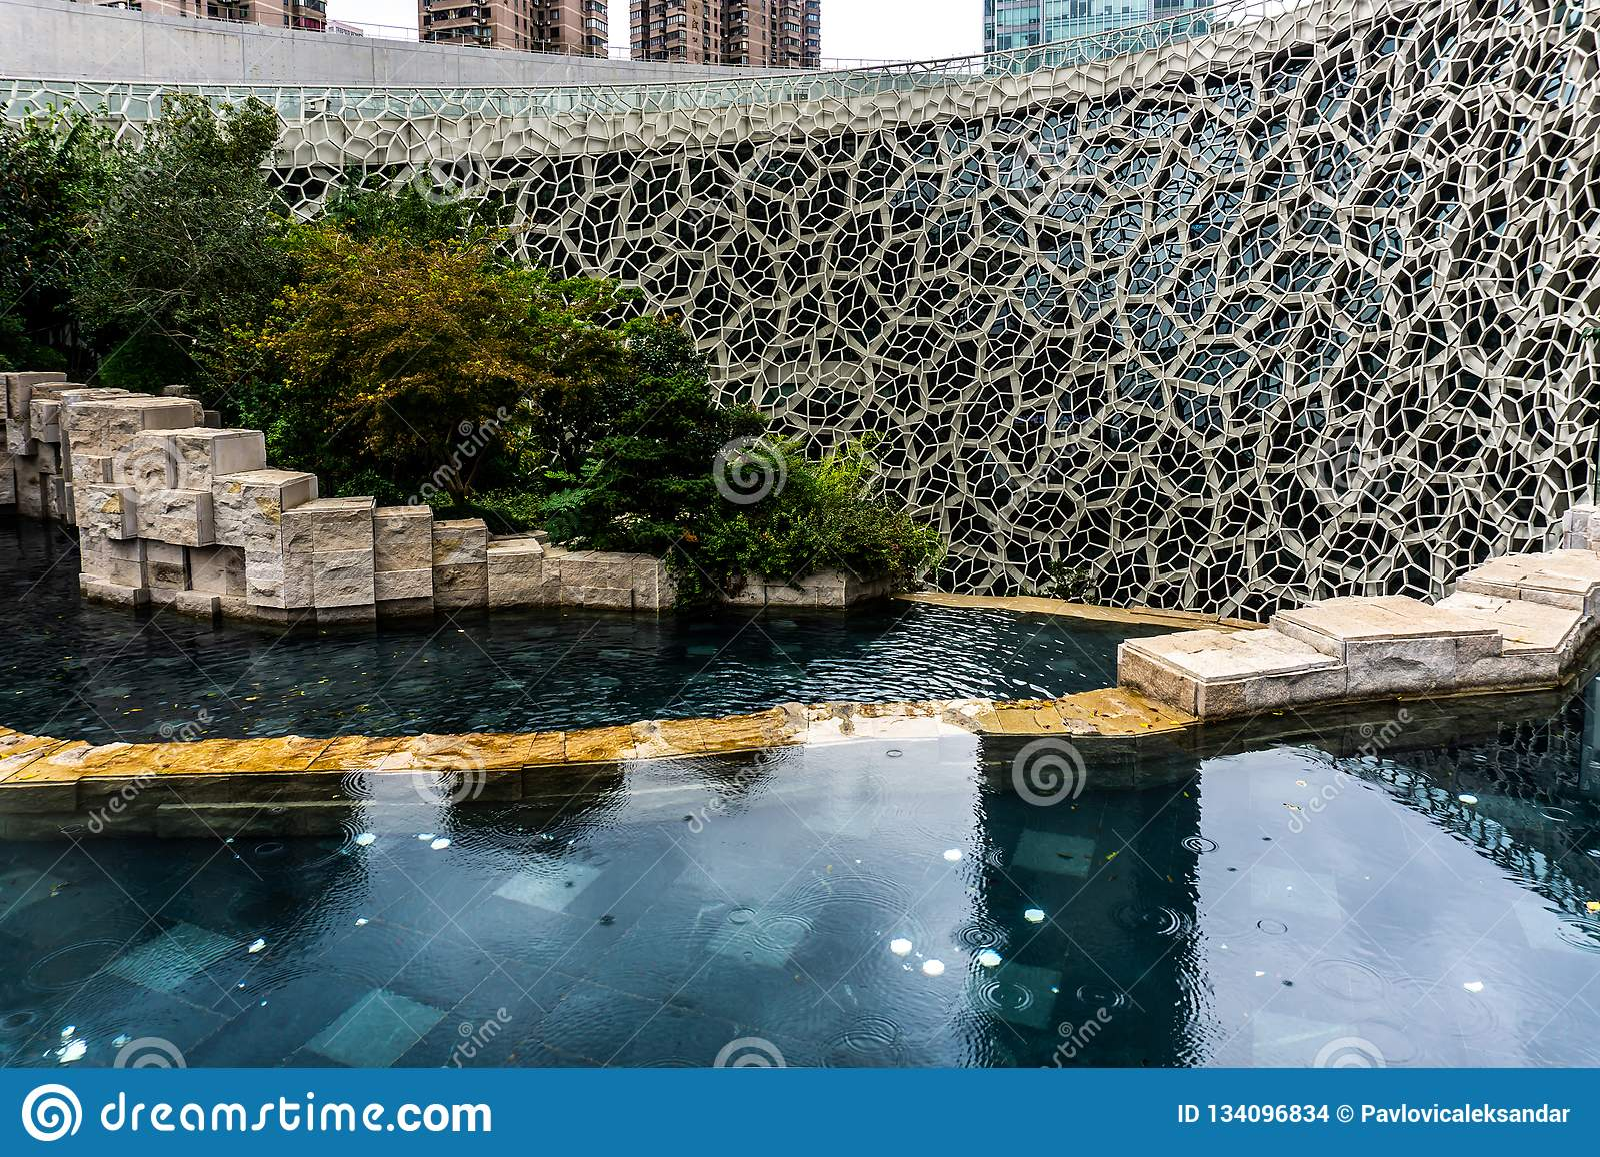 Shanghai Natural History Museum 3